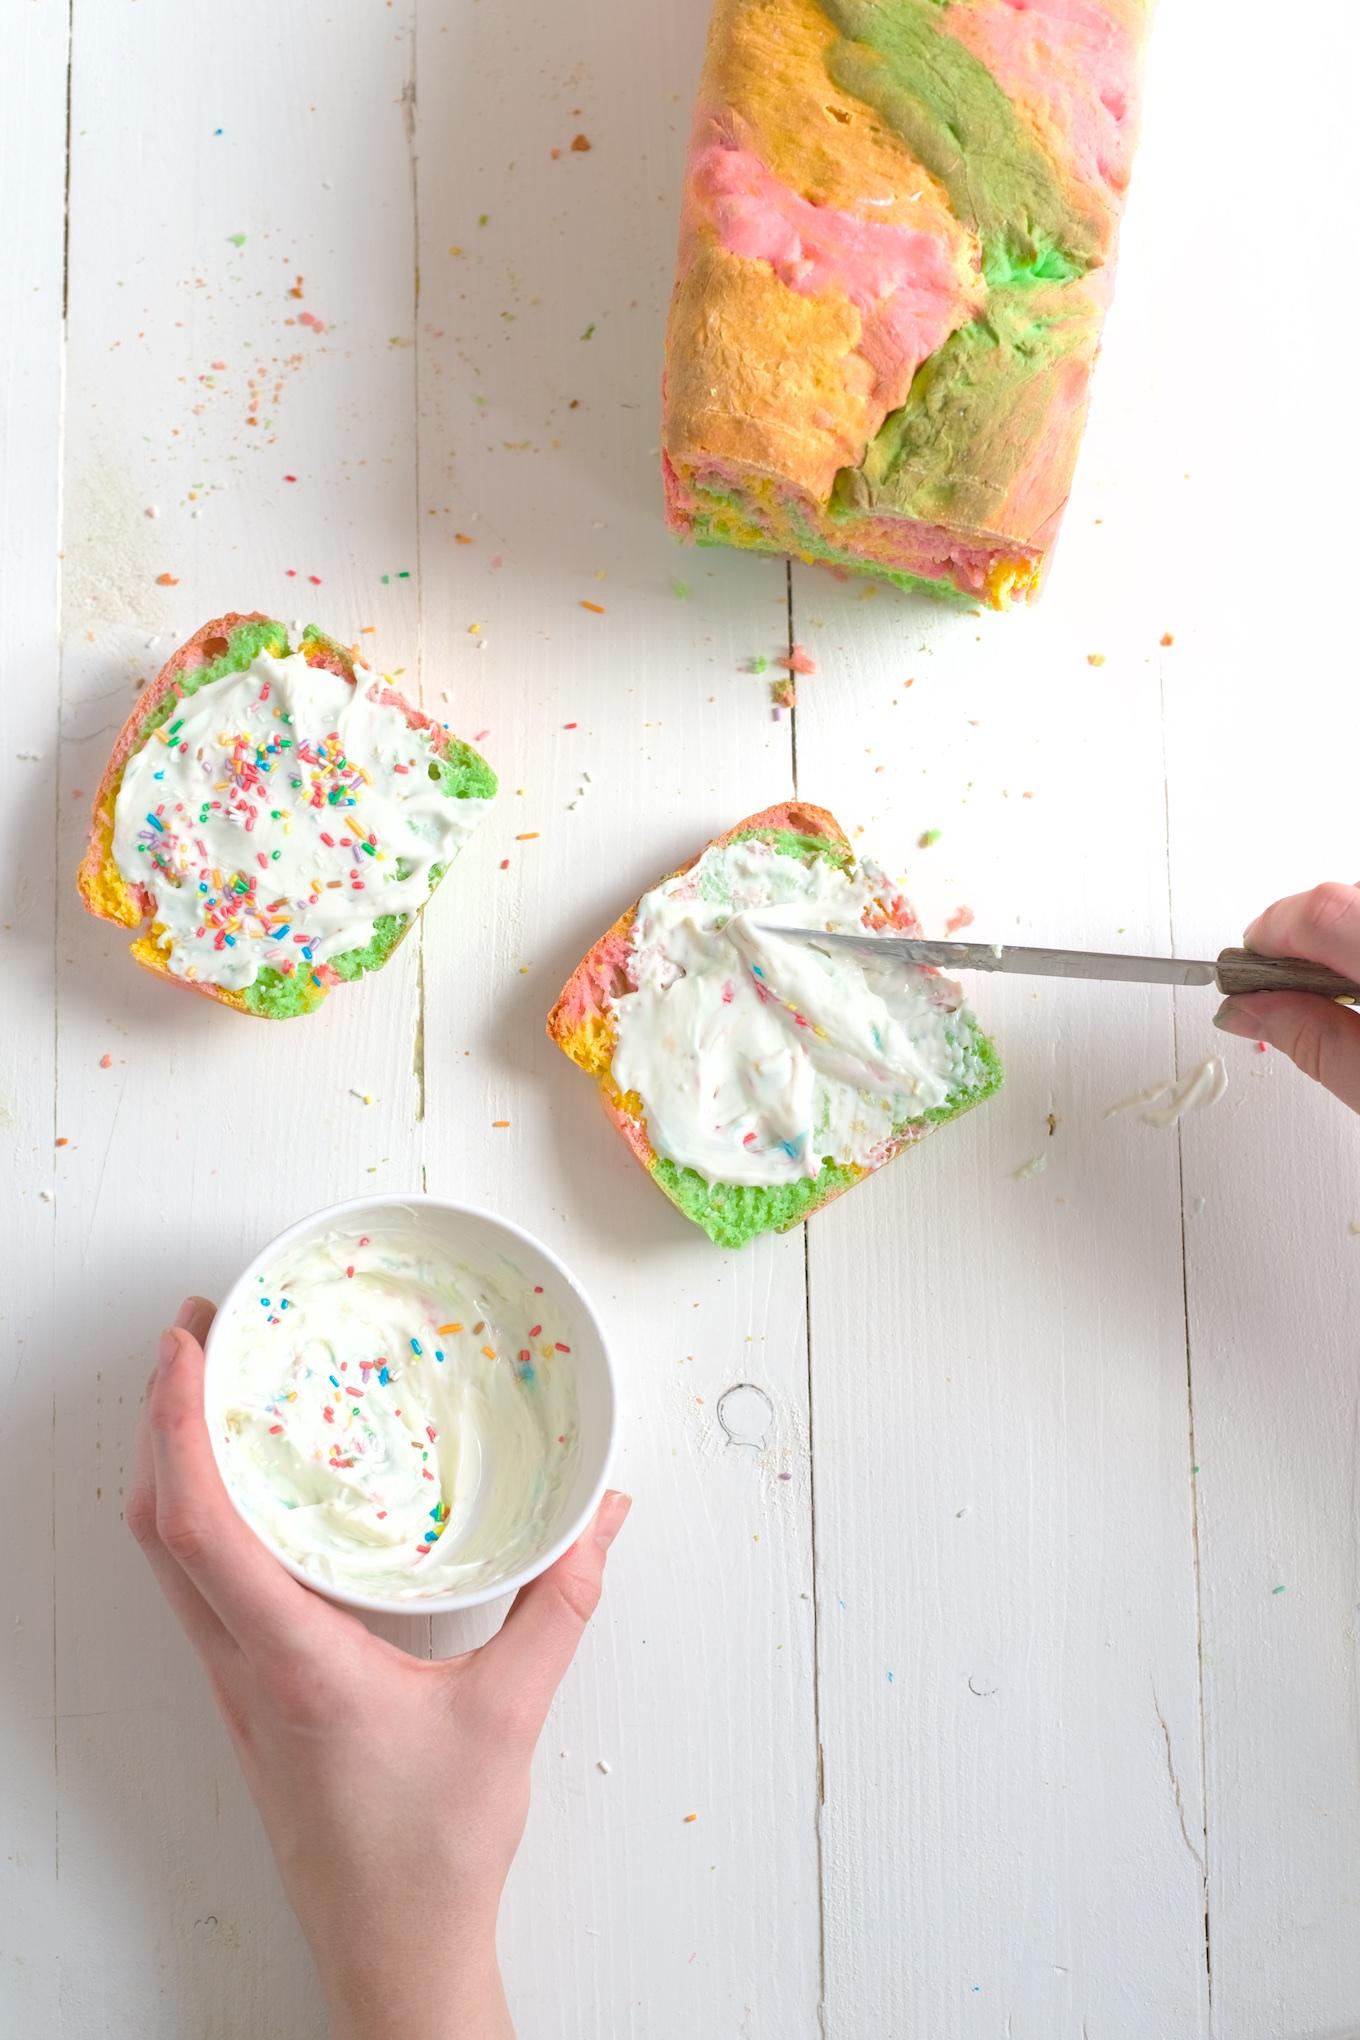 regenboog brood, brood met kleurstof